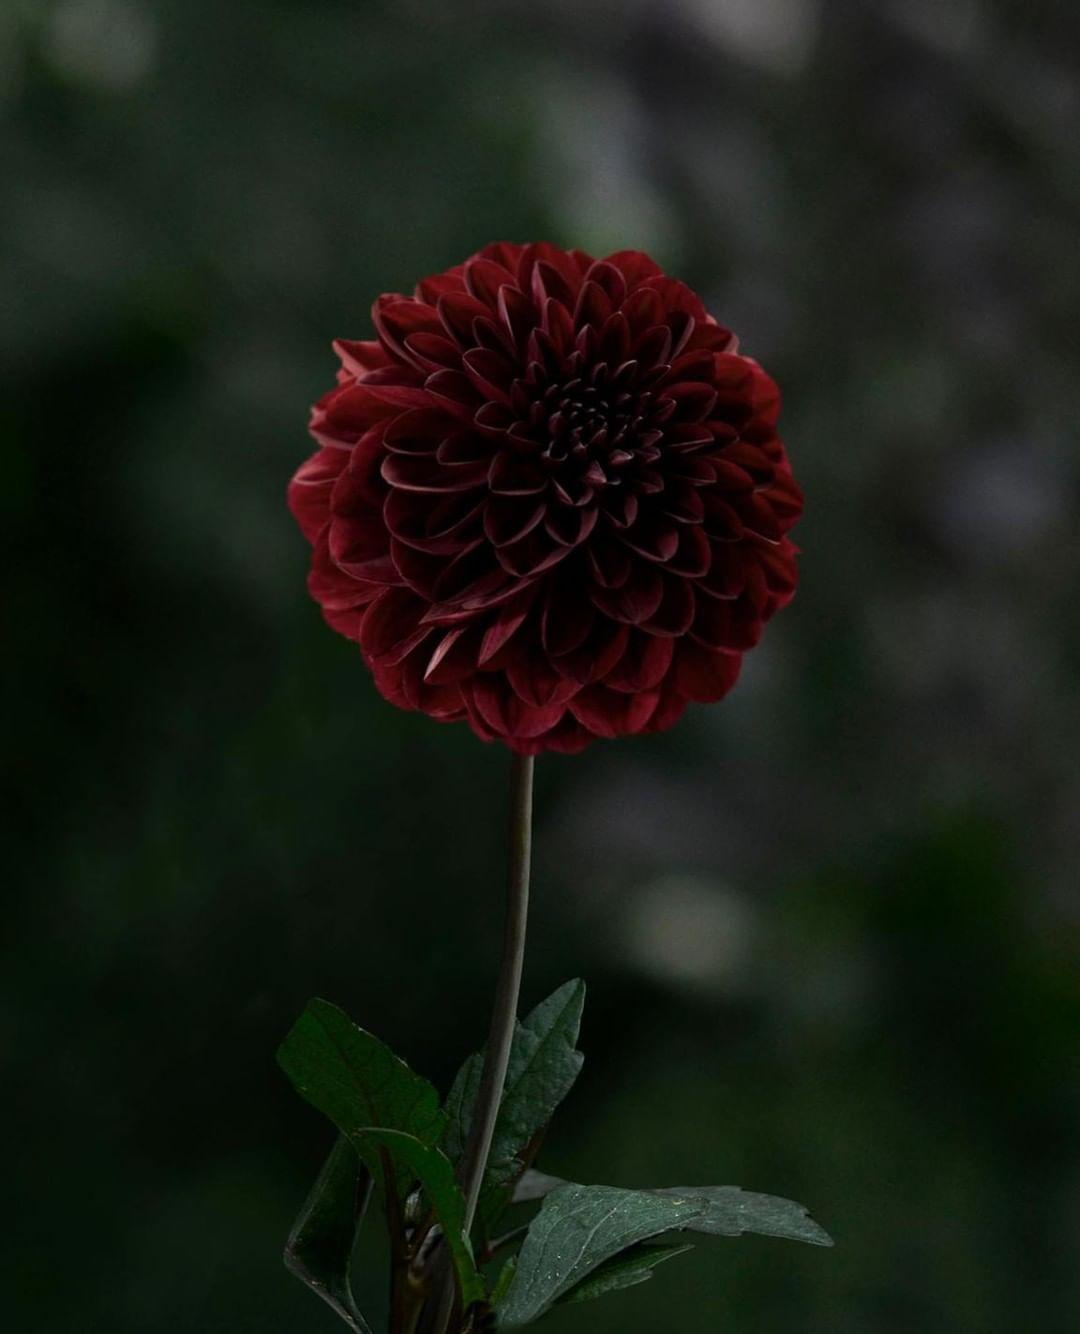 Dahlia Dark Spirit Is A Dark Red Almost Black Coloured Dahlia Admirable And Striking In The Flower Beds And Beautifu Dark Flowers Dark Spirit Black Flowers